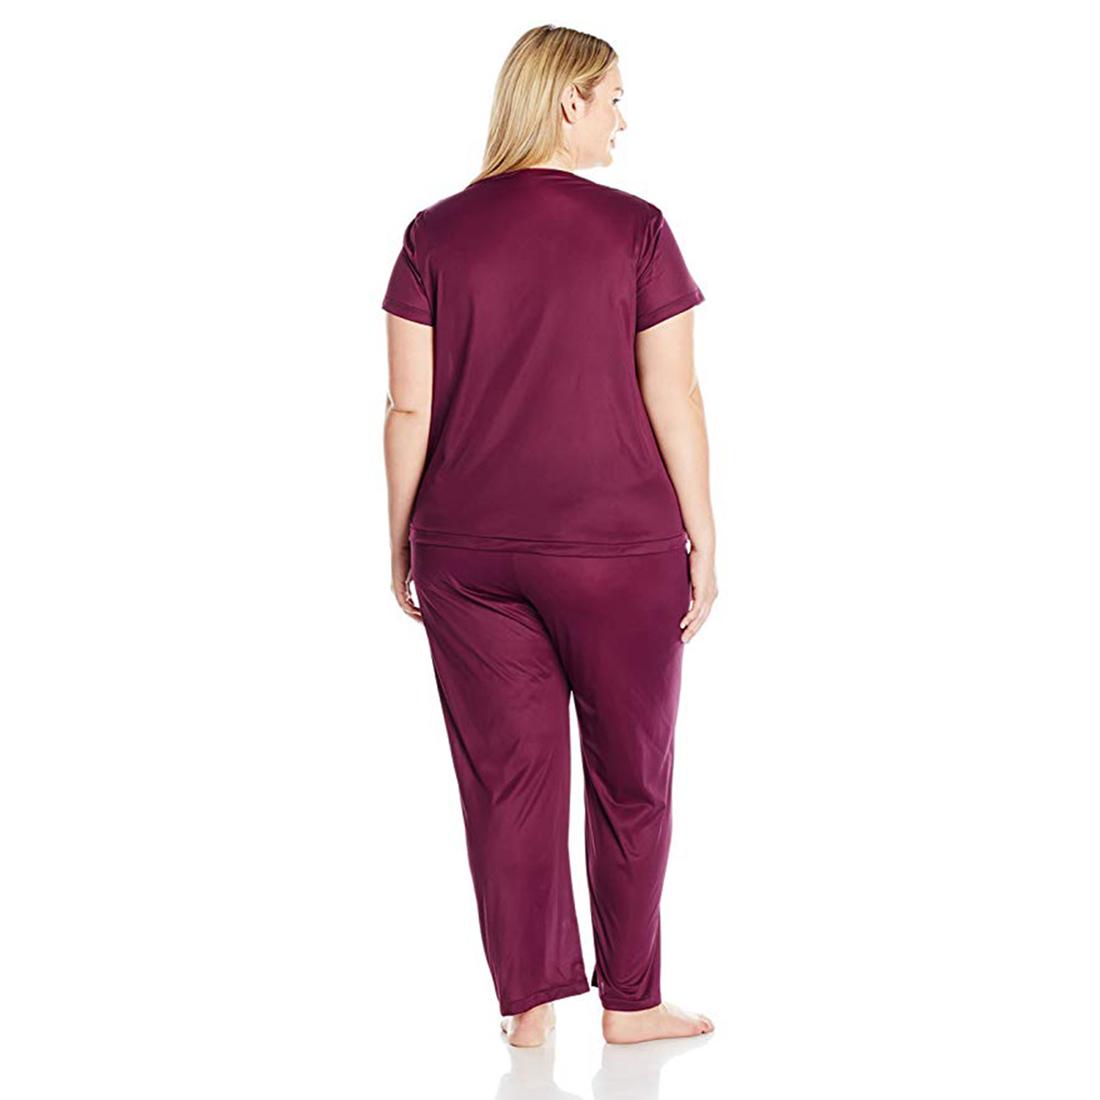 Vanity-Fair-Women-039-s-Plus-Size-Coloratura-Sleepwear-Pajama-Set-90807 thumbnail 3